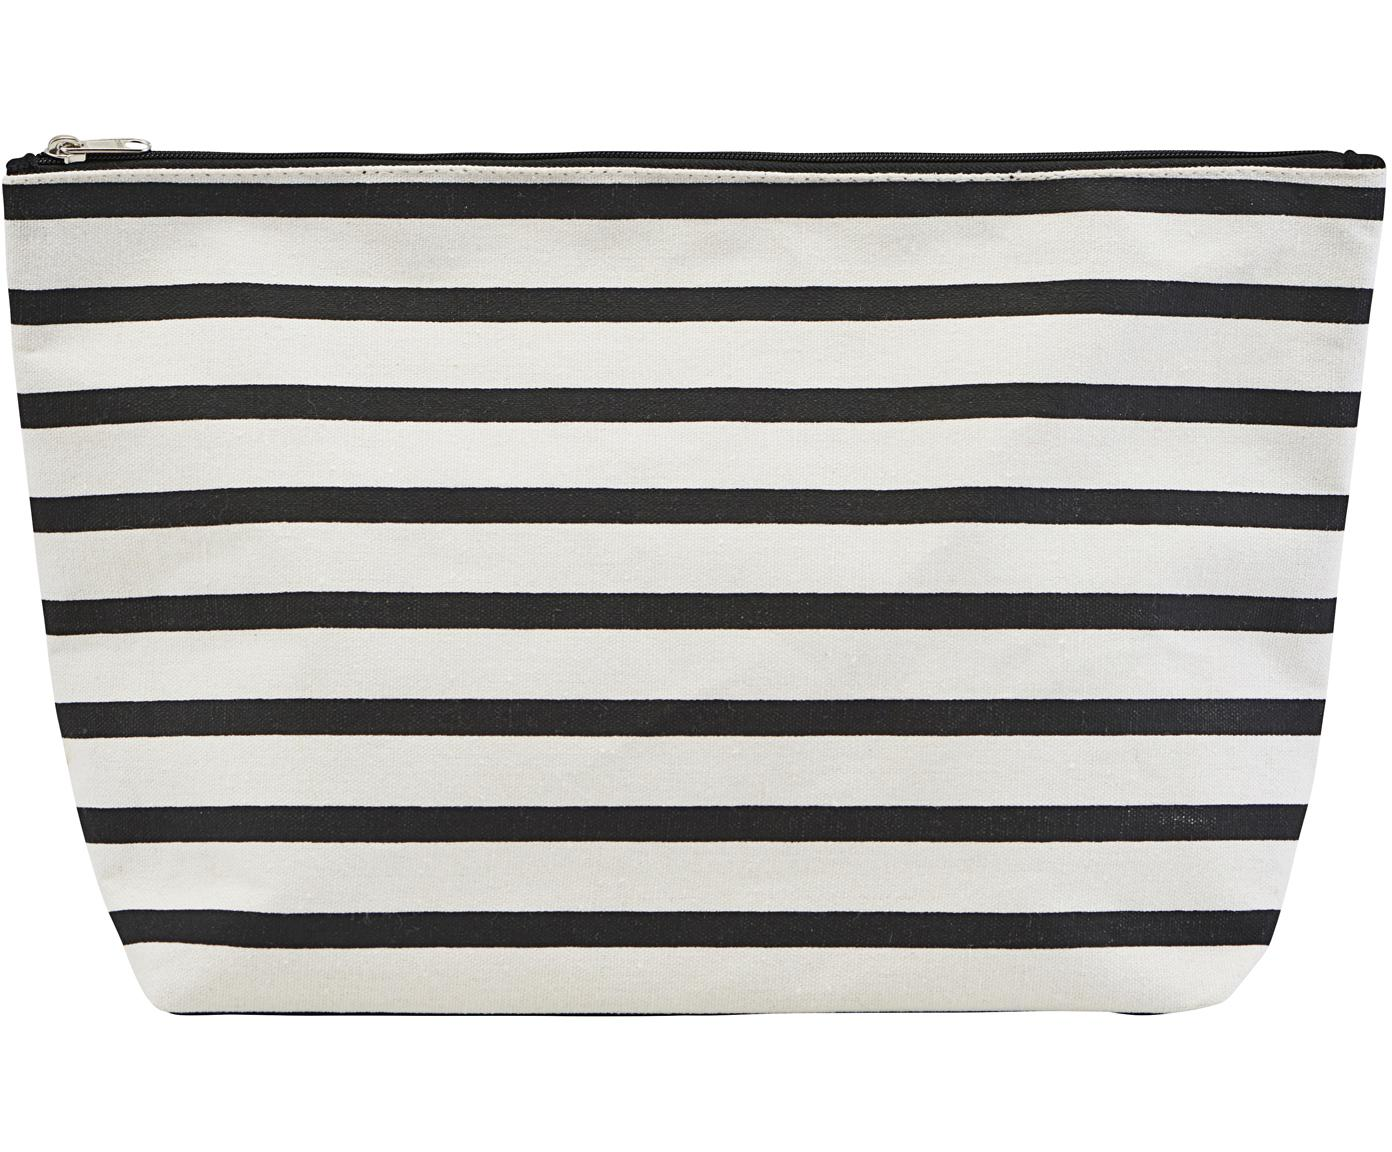 Neceser Stripes, 38%algodón, 40%poliéster, 22%rayón, Negro, blanco, An 32 x Al 20 cm